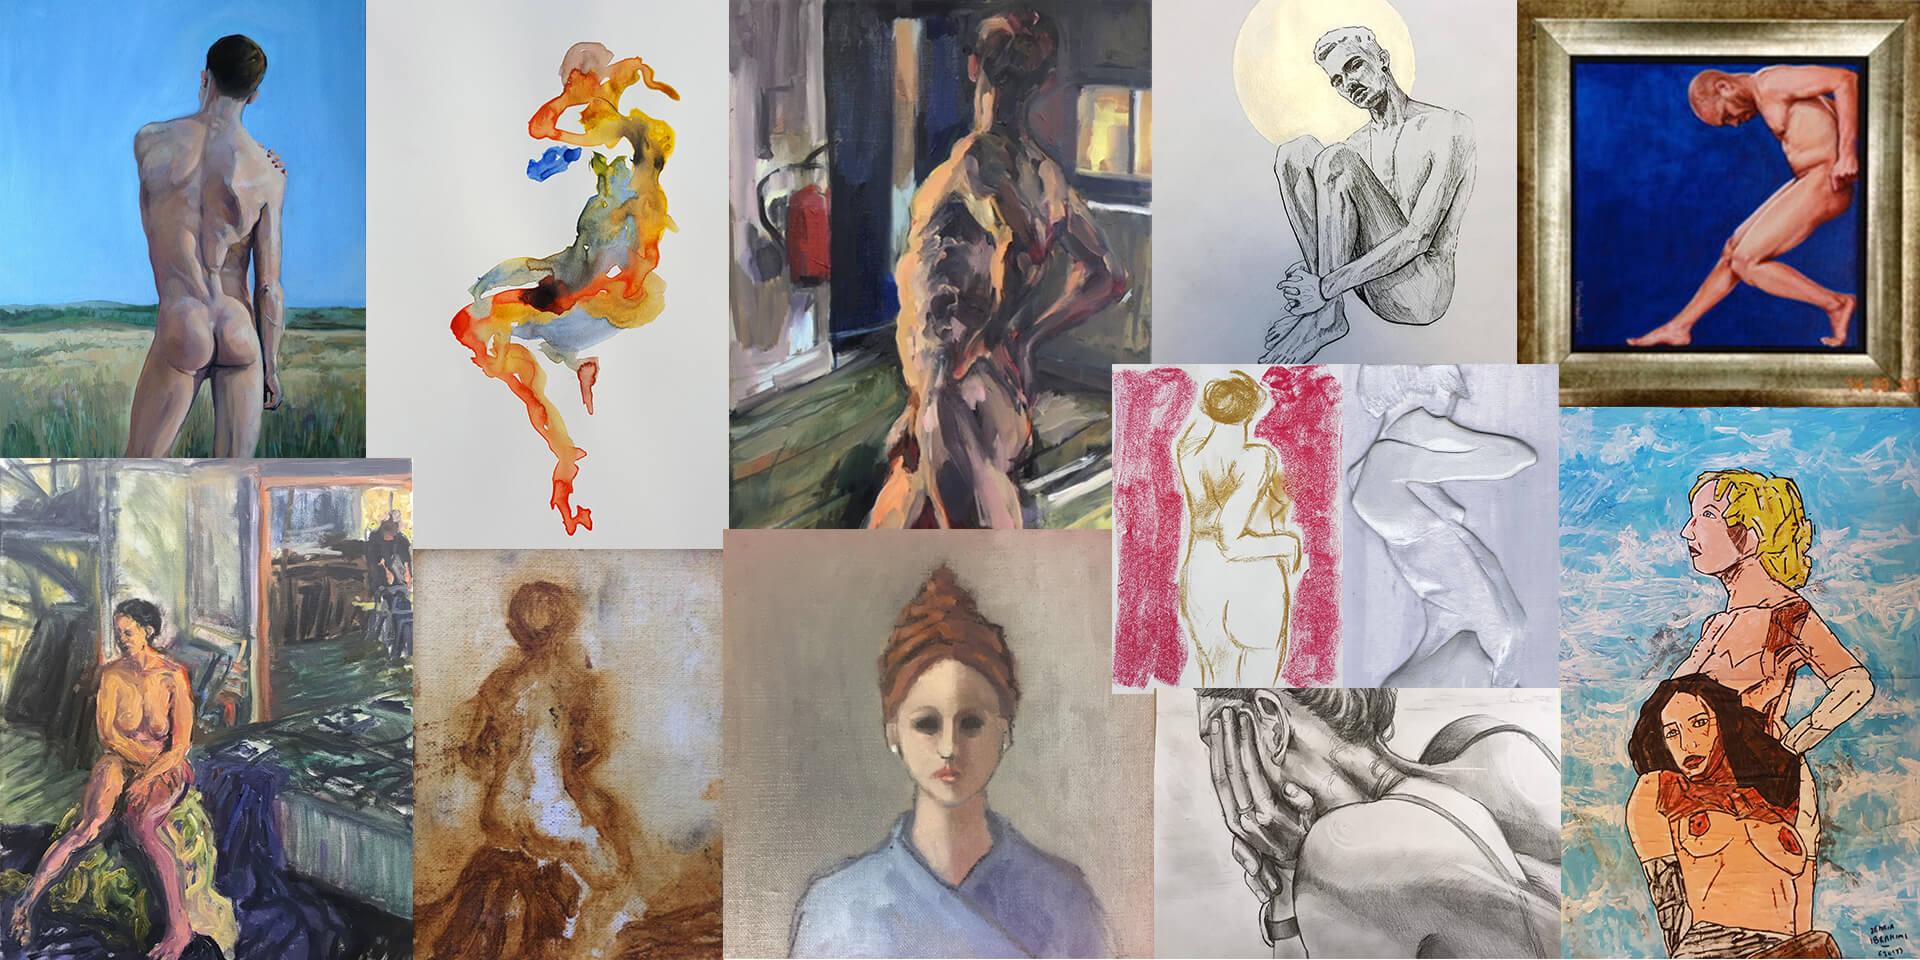 Pop-up exhibition - Celebrating Figuration's creative community